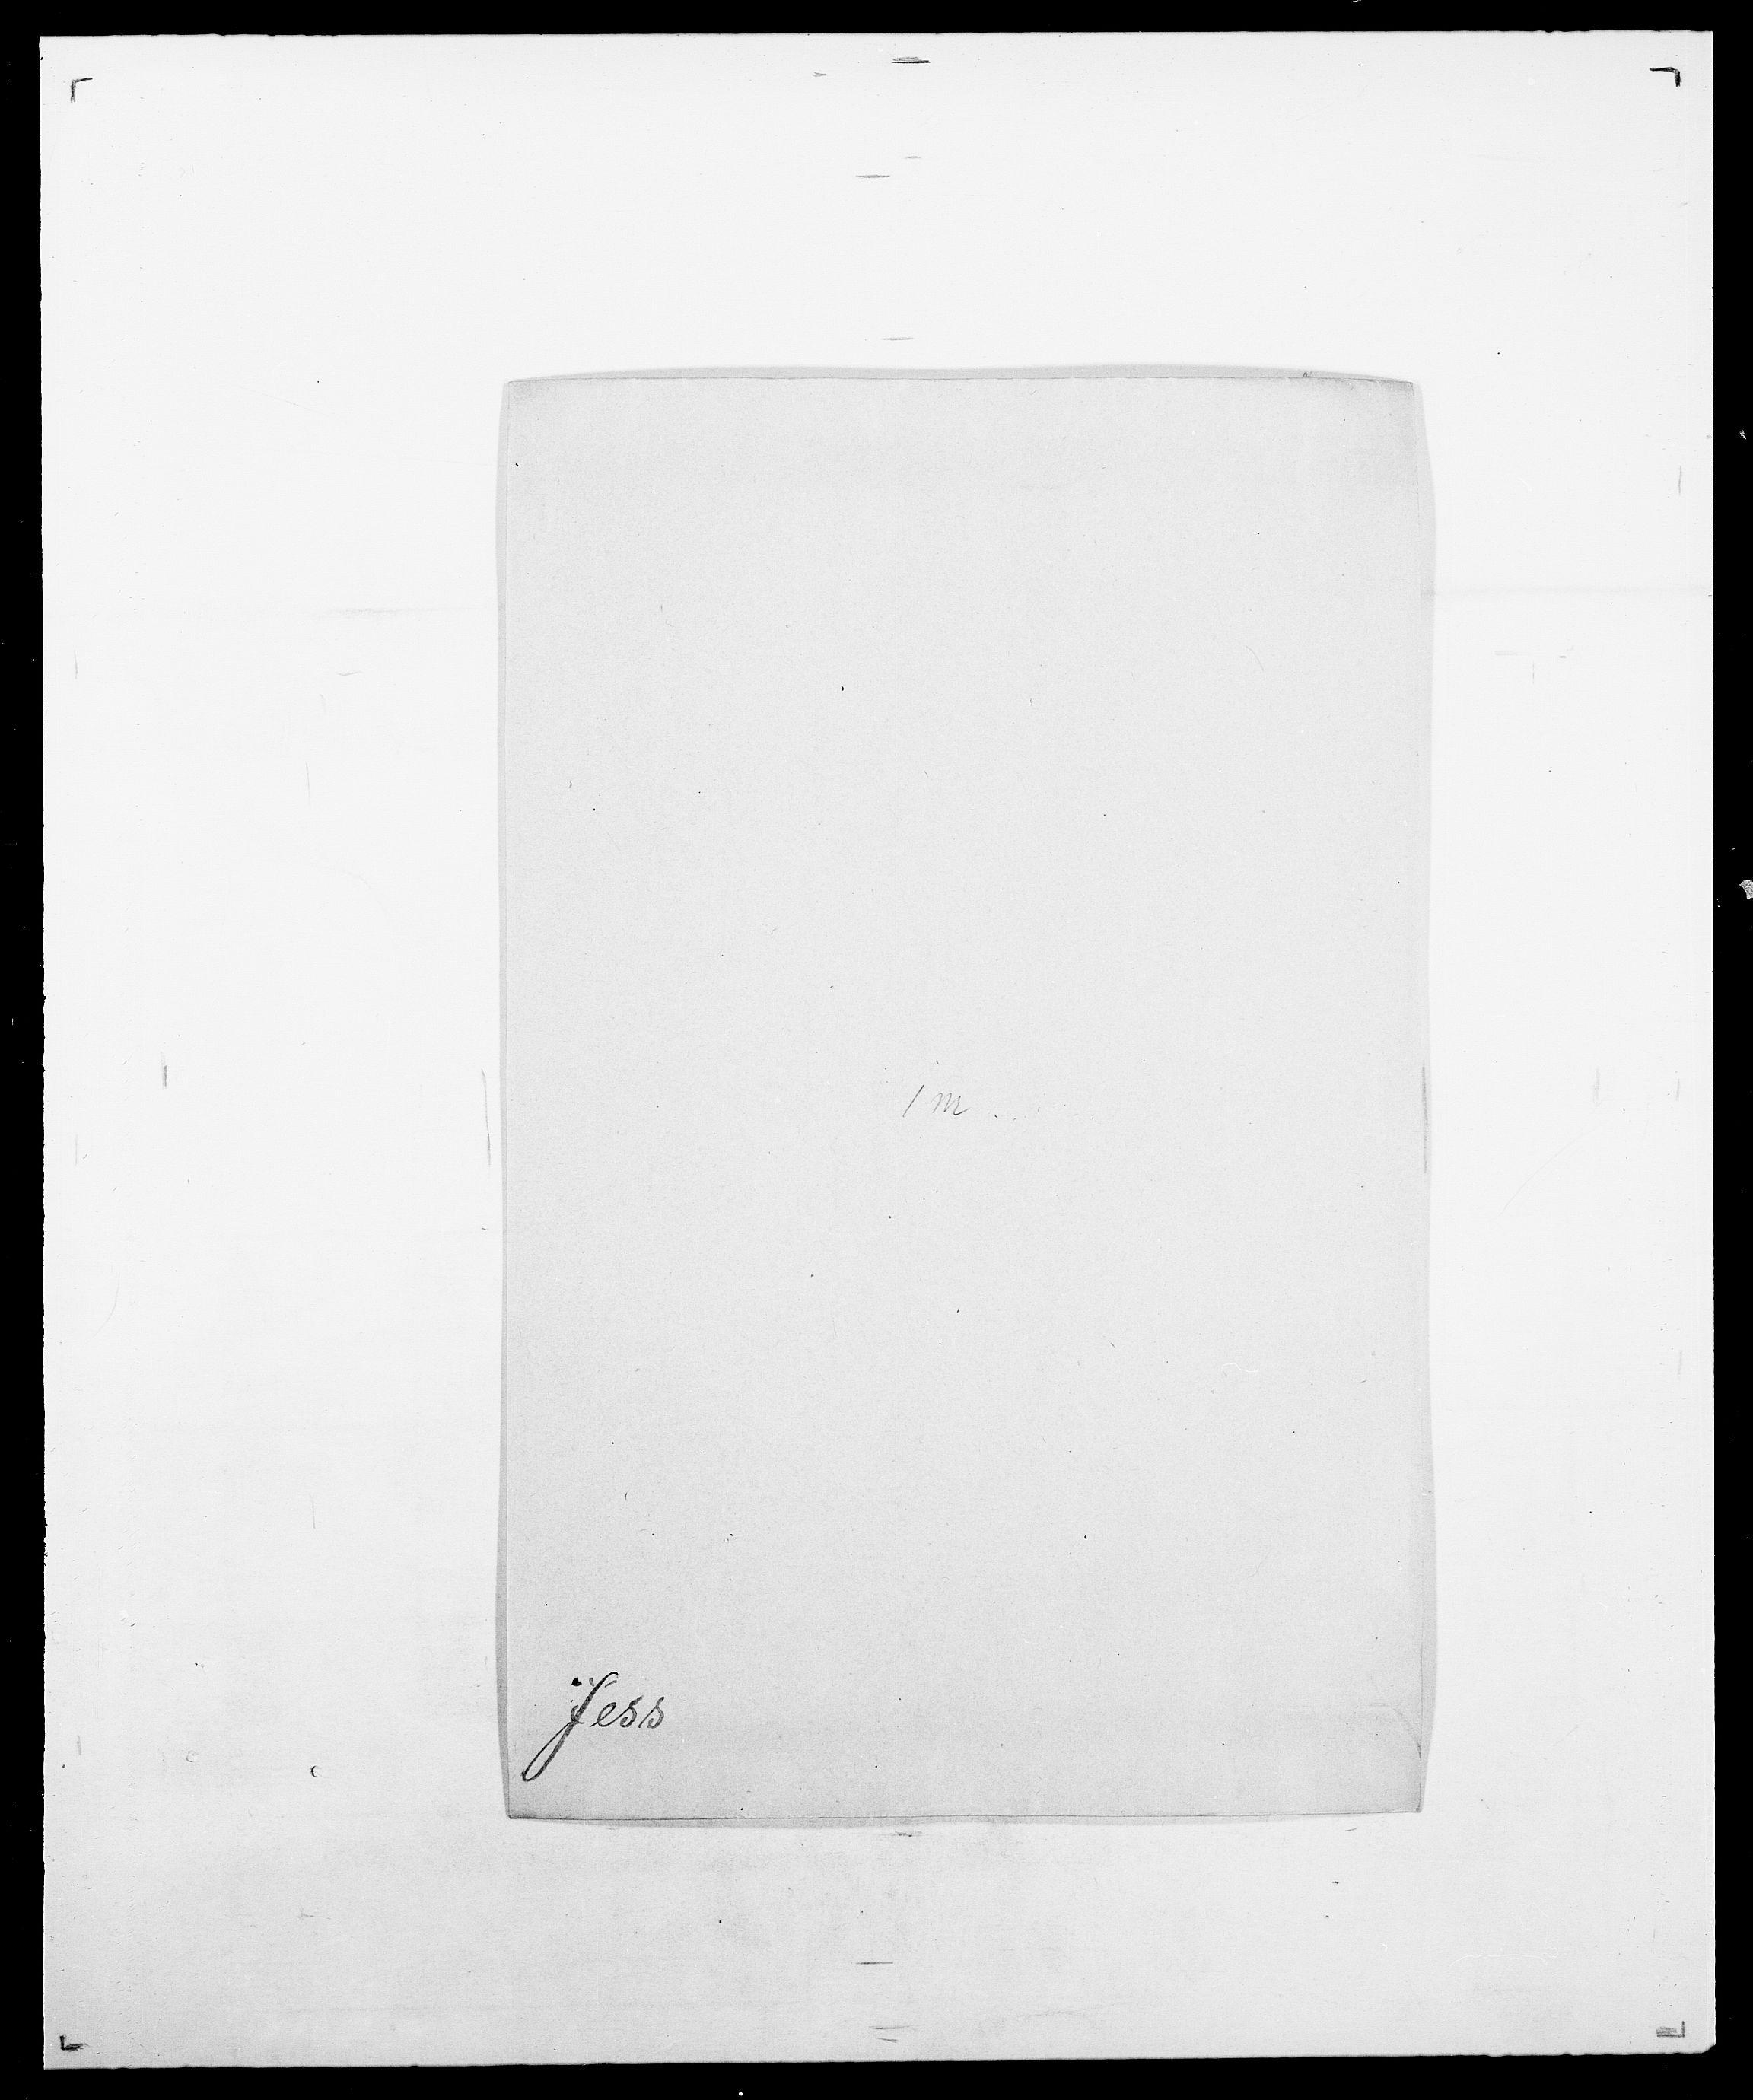 SAO, Delgobe, Charles Antoine - samling, D/Da/L0019: van der Hude - Joys, s. 724